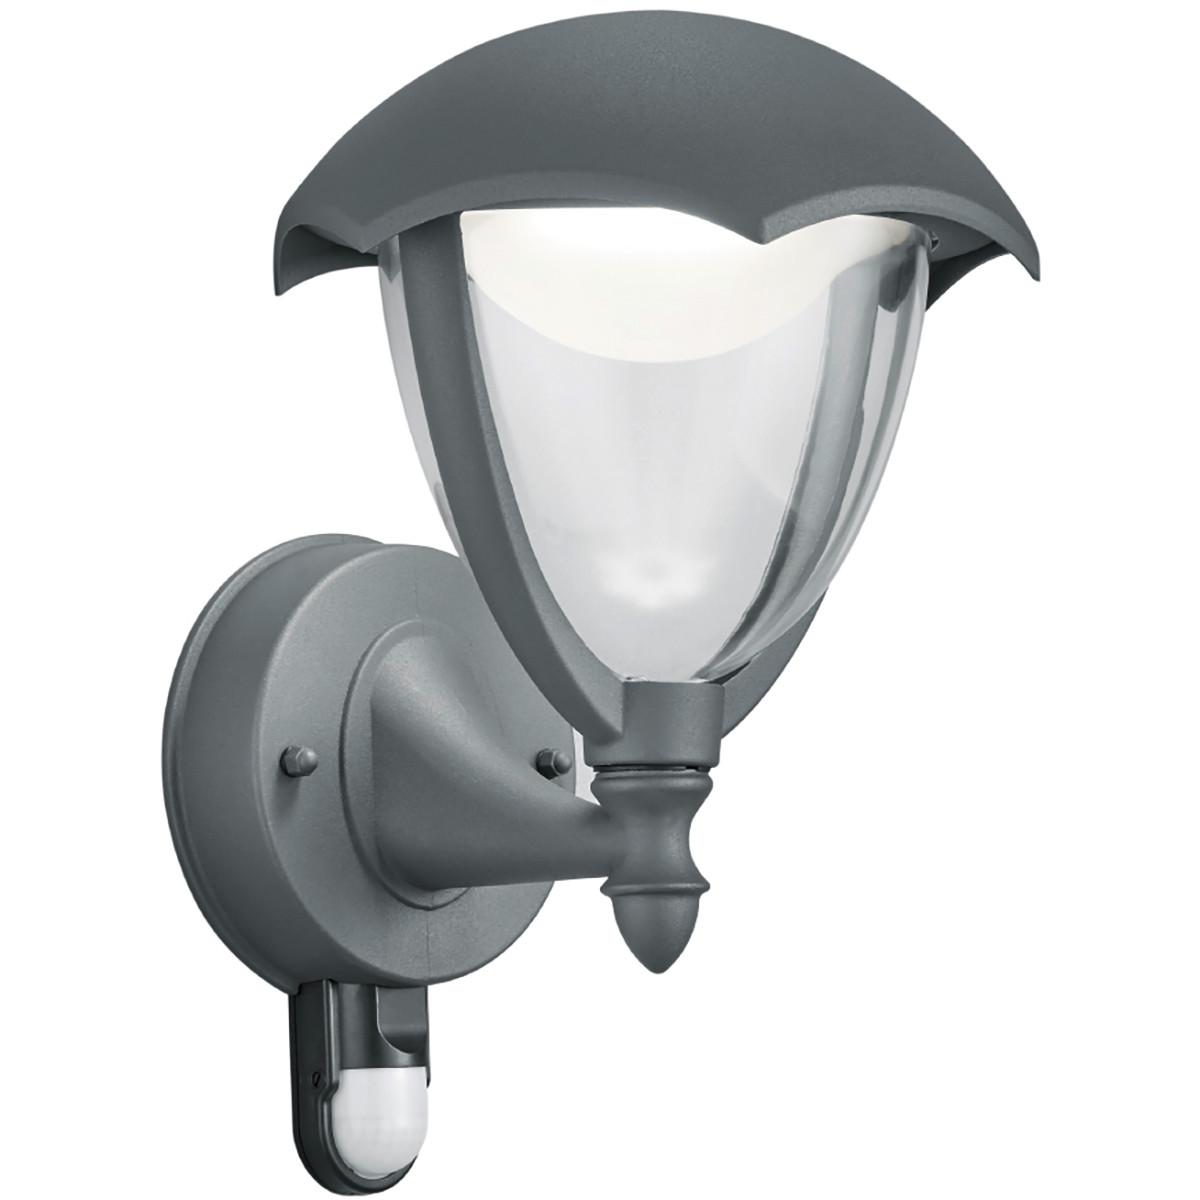 LED Tuinverlichting - Tuinlamp - Trion Grichto - Wand - Bewegingssensor - 6W - Mat Antraciet - Alumi